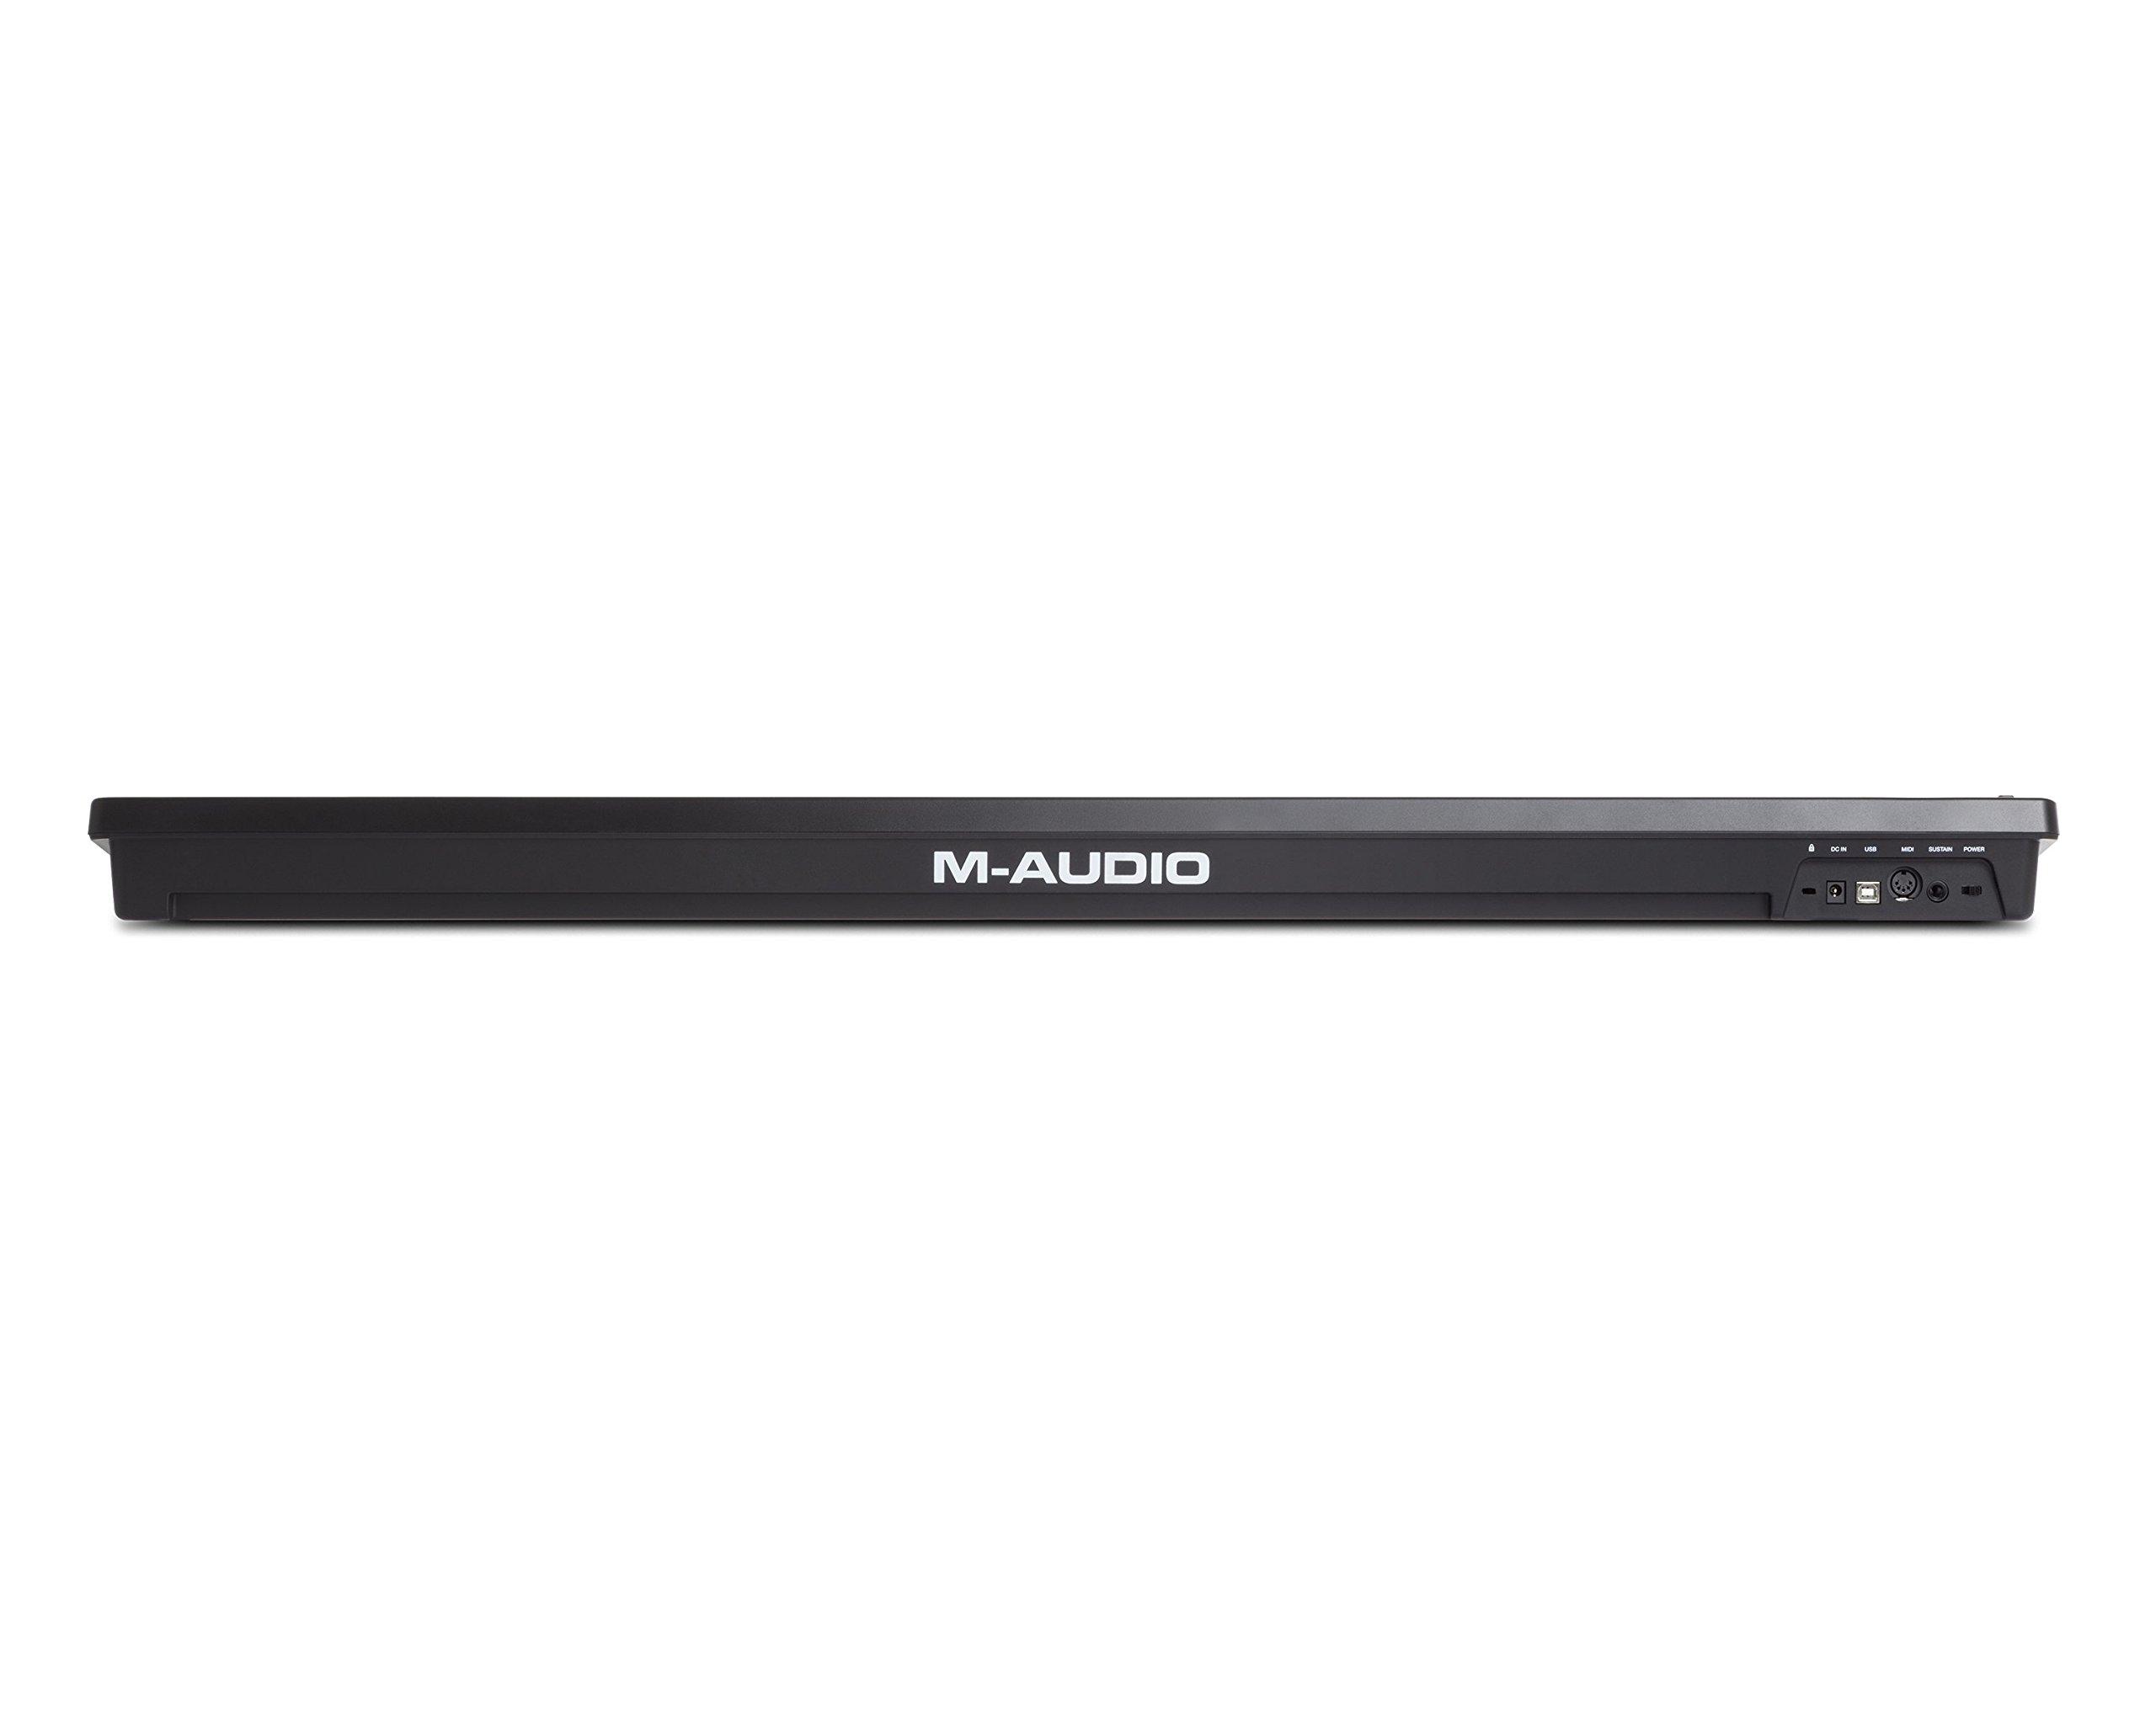 M-Audio Keystation 61MK3 | Compact Semi-Weighted 61-Key USB-Powered MIDI Keyboard Controller by M-Audio (Image #5)